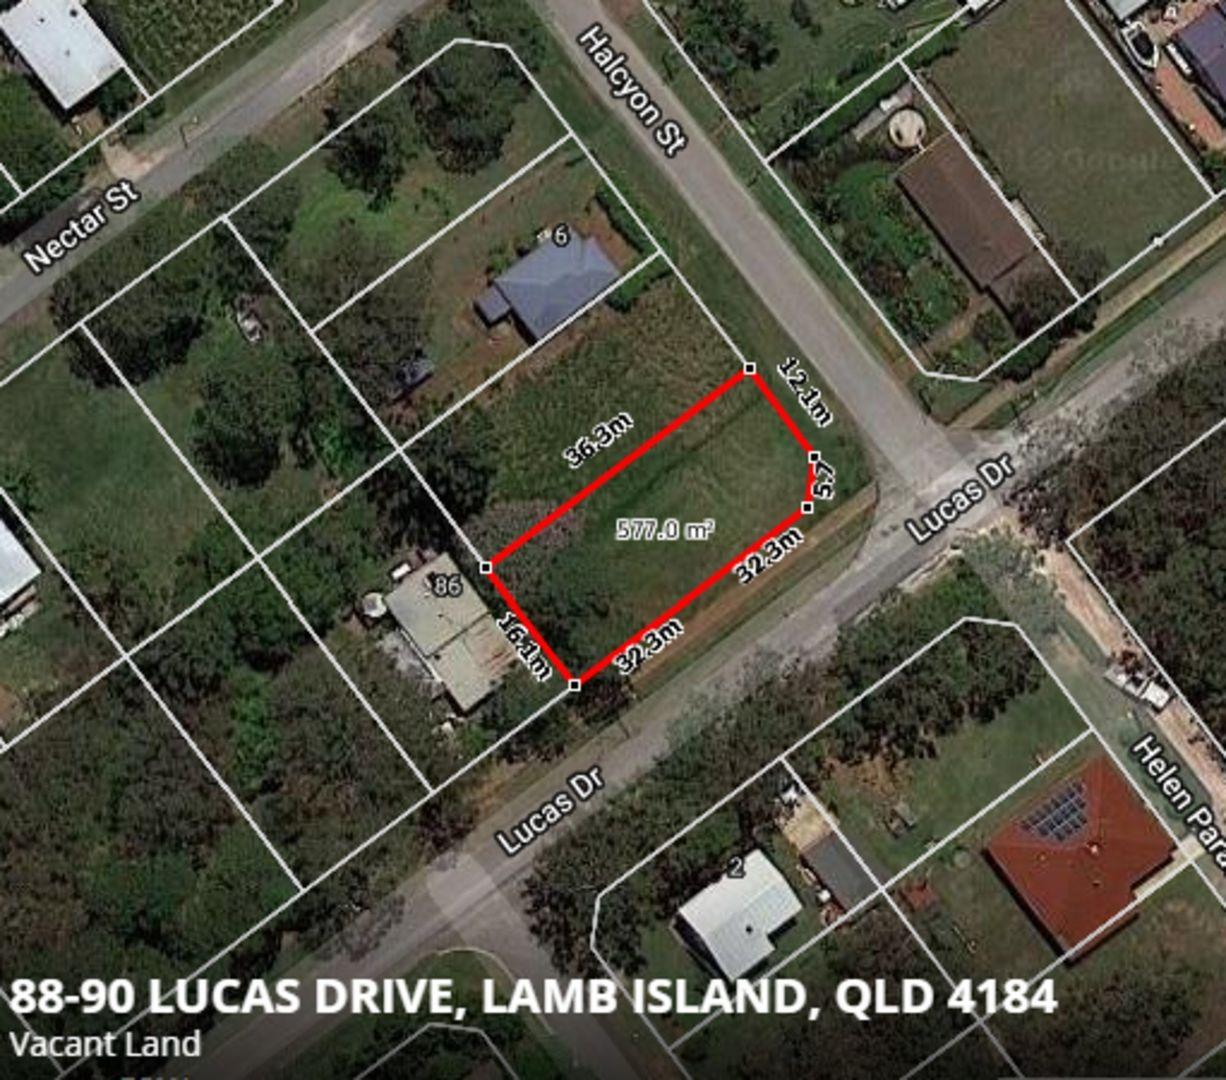 88 lucas Drive, Lamb Island QLD 4184, Image 0